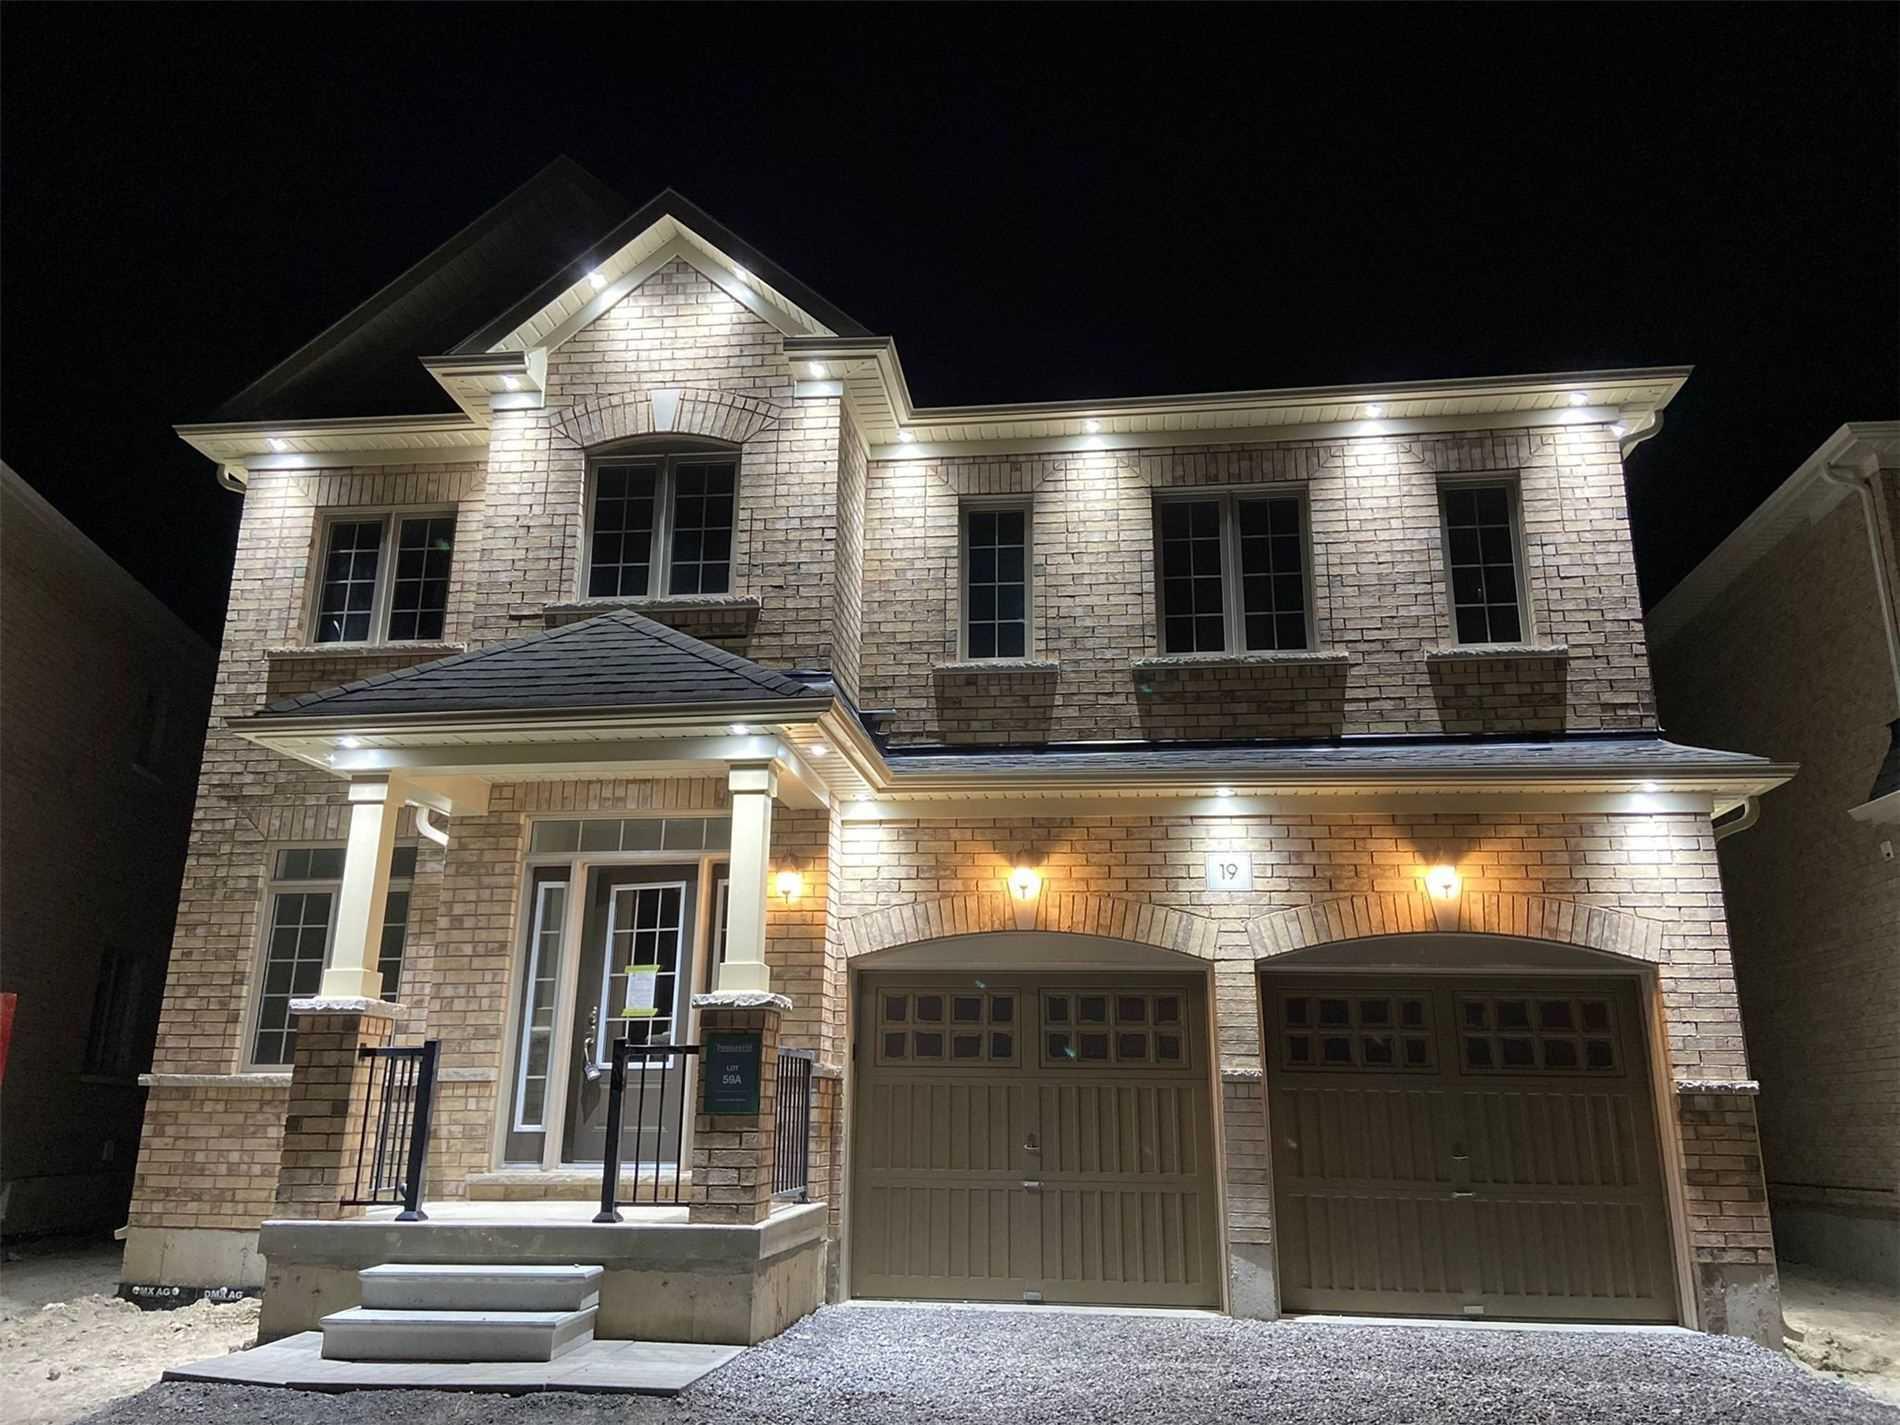 Detached house For Sale In Clarington - 19 Douglas Kemp Cres, Clarington, Ontario, Canada L1C 7E3 , 4 Bedrooms Bedrooms, ,5 BathroomsBathrooms,Detached,For Sale,Douglas Kemp